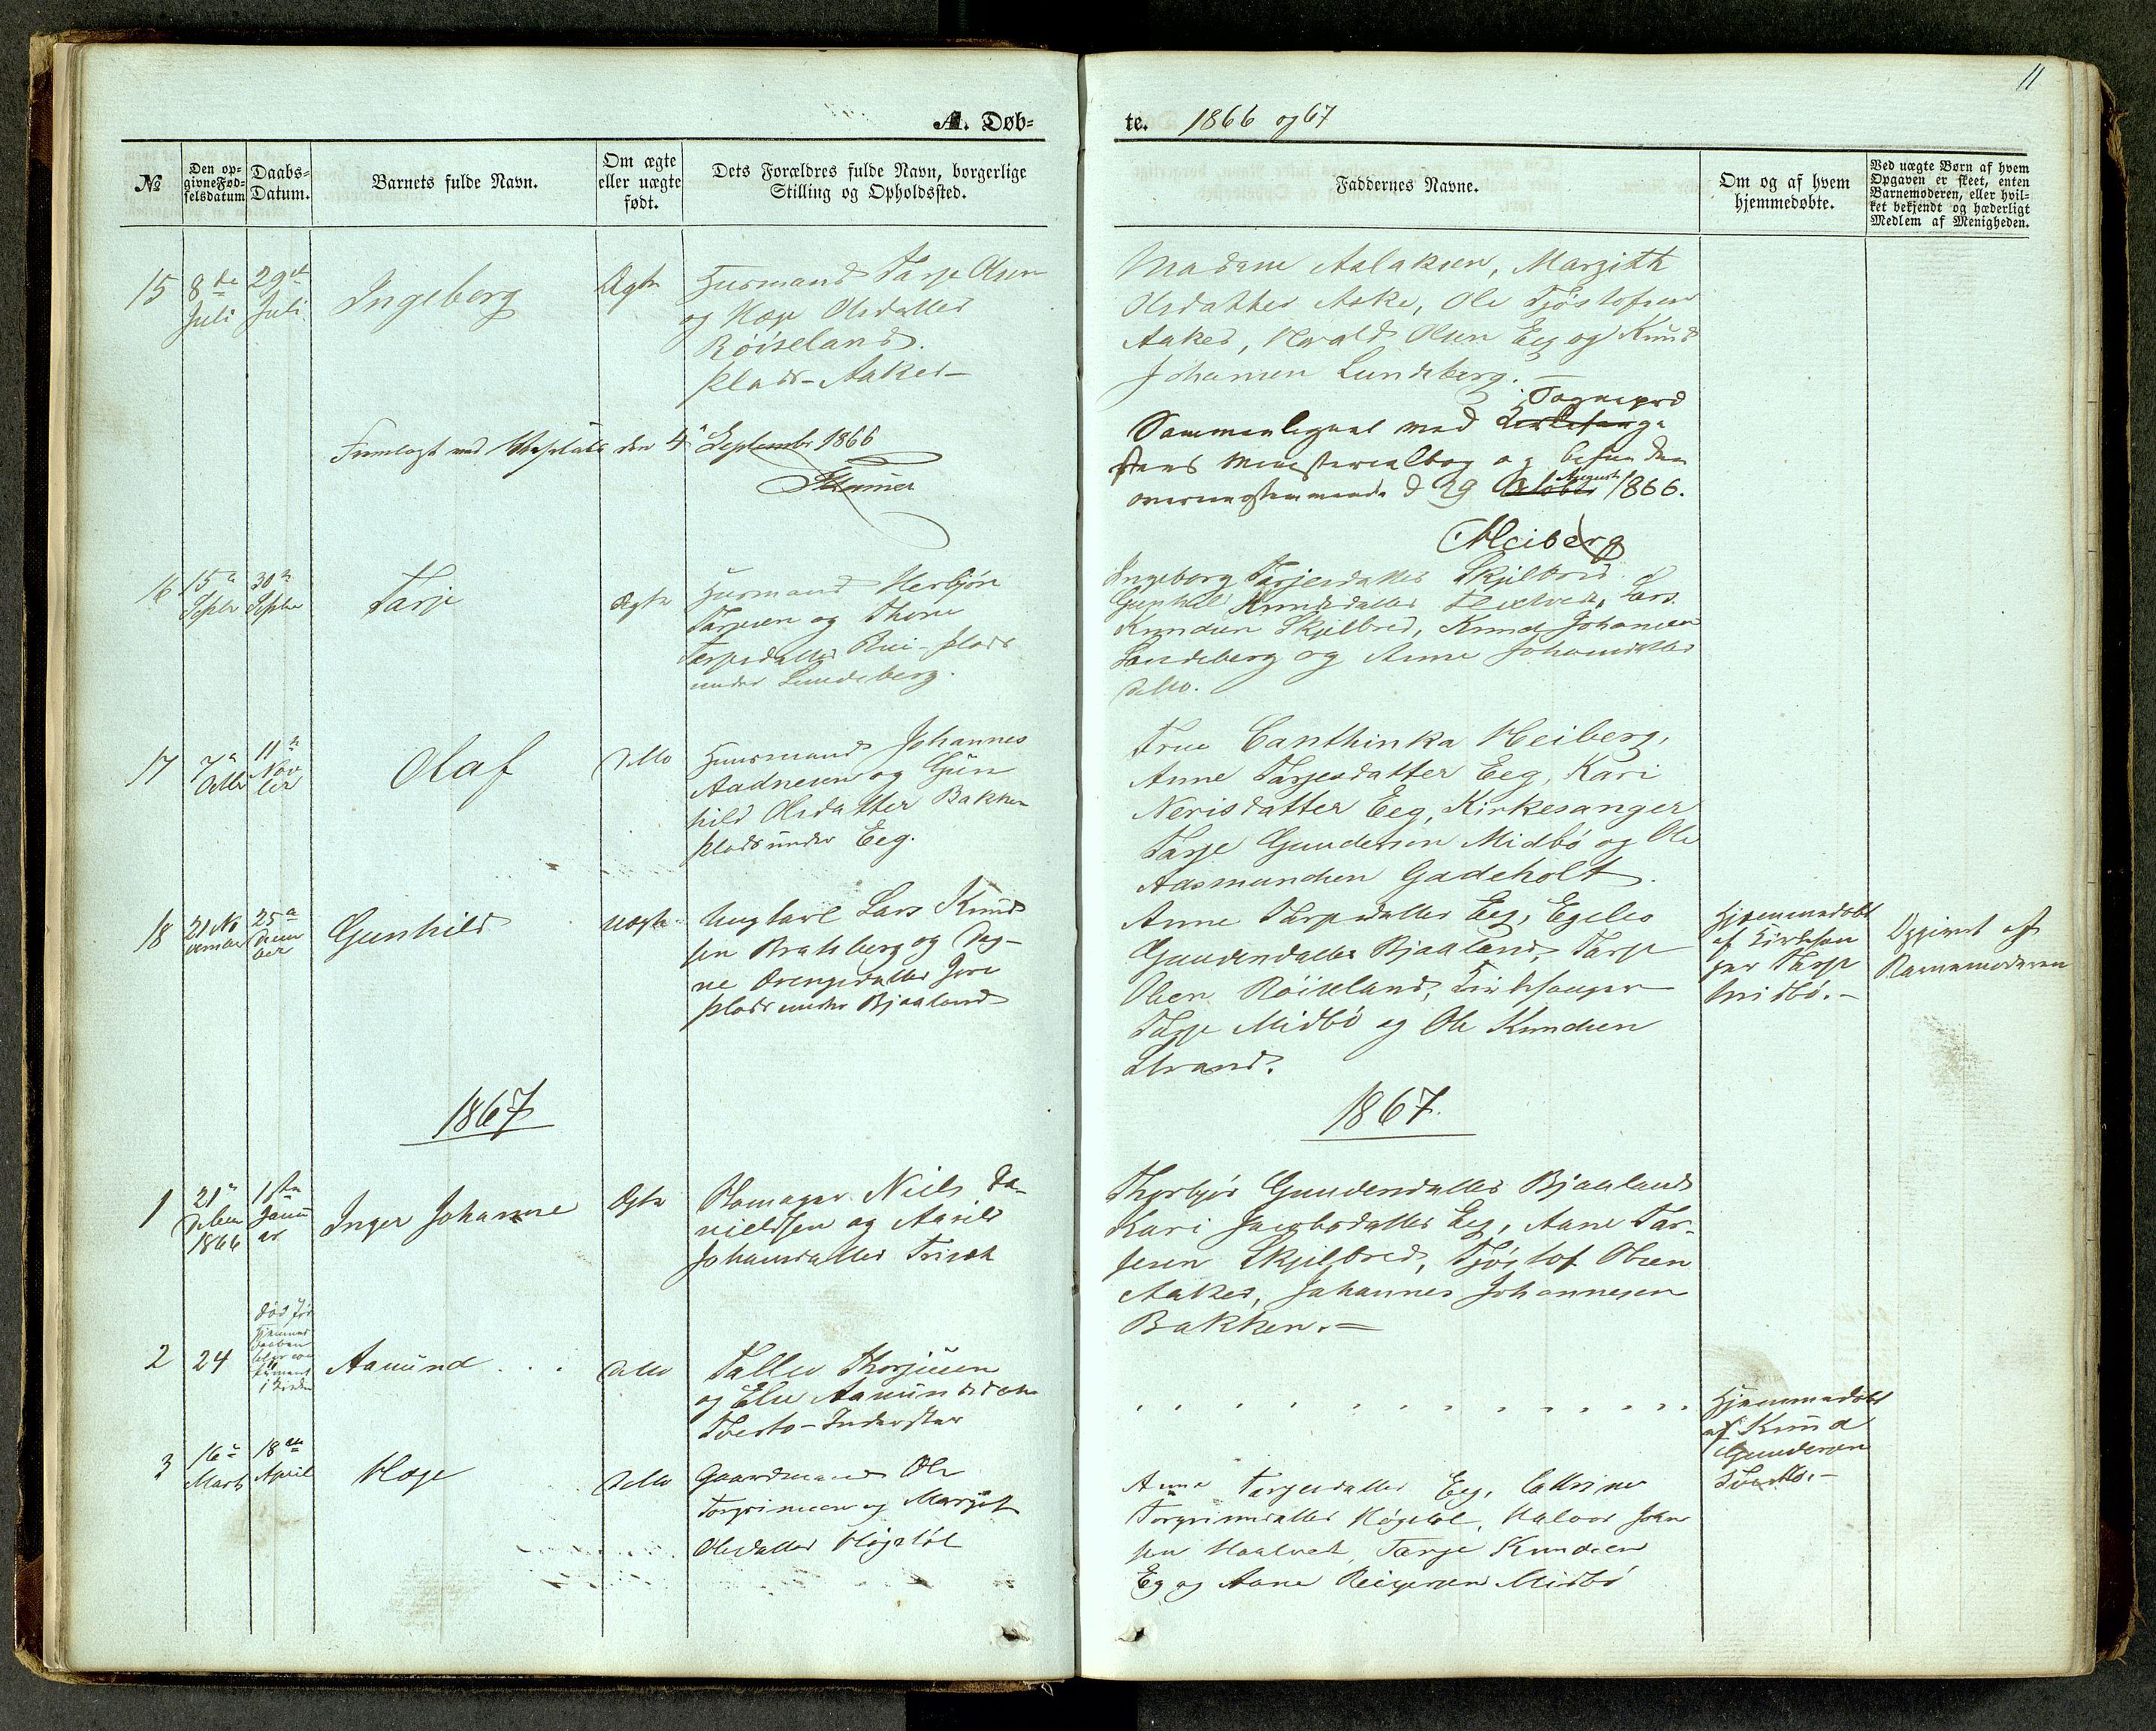 SAKO, Lårdal kirkebøker, G/Ga/L0002: Klokkerbok nr. I 2, 1861-1890, s. 11